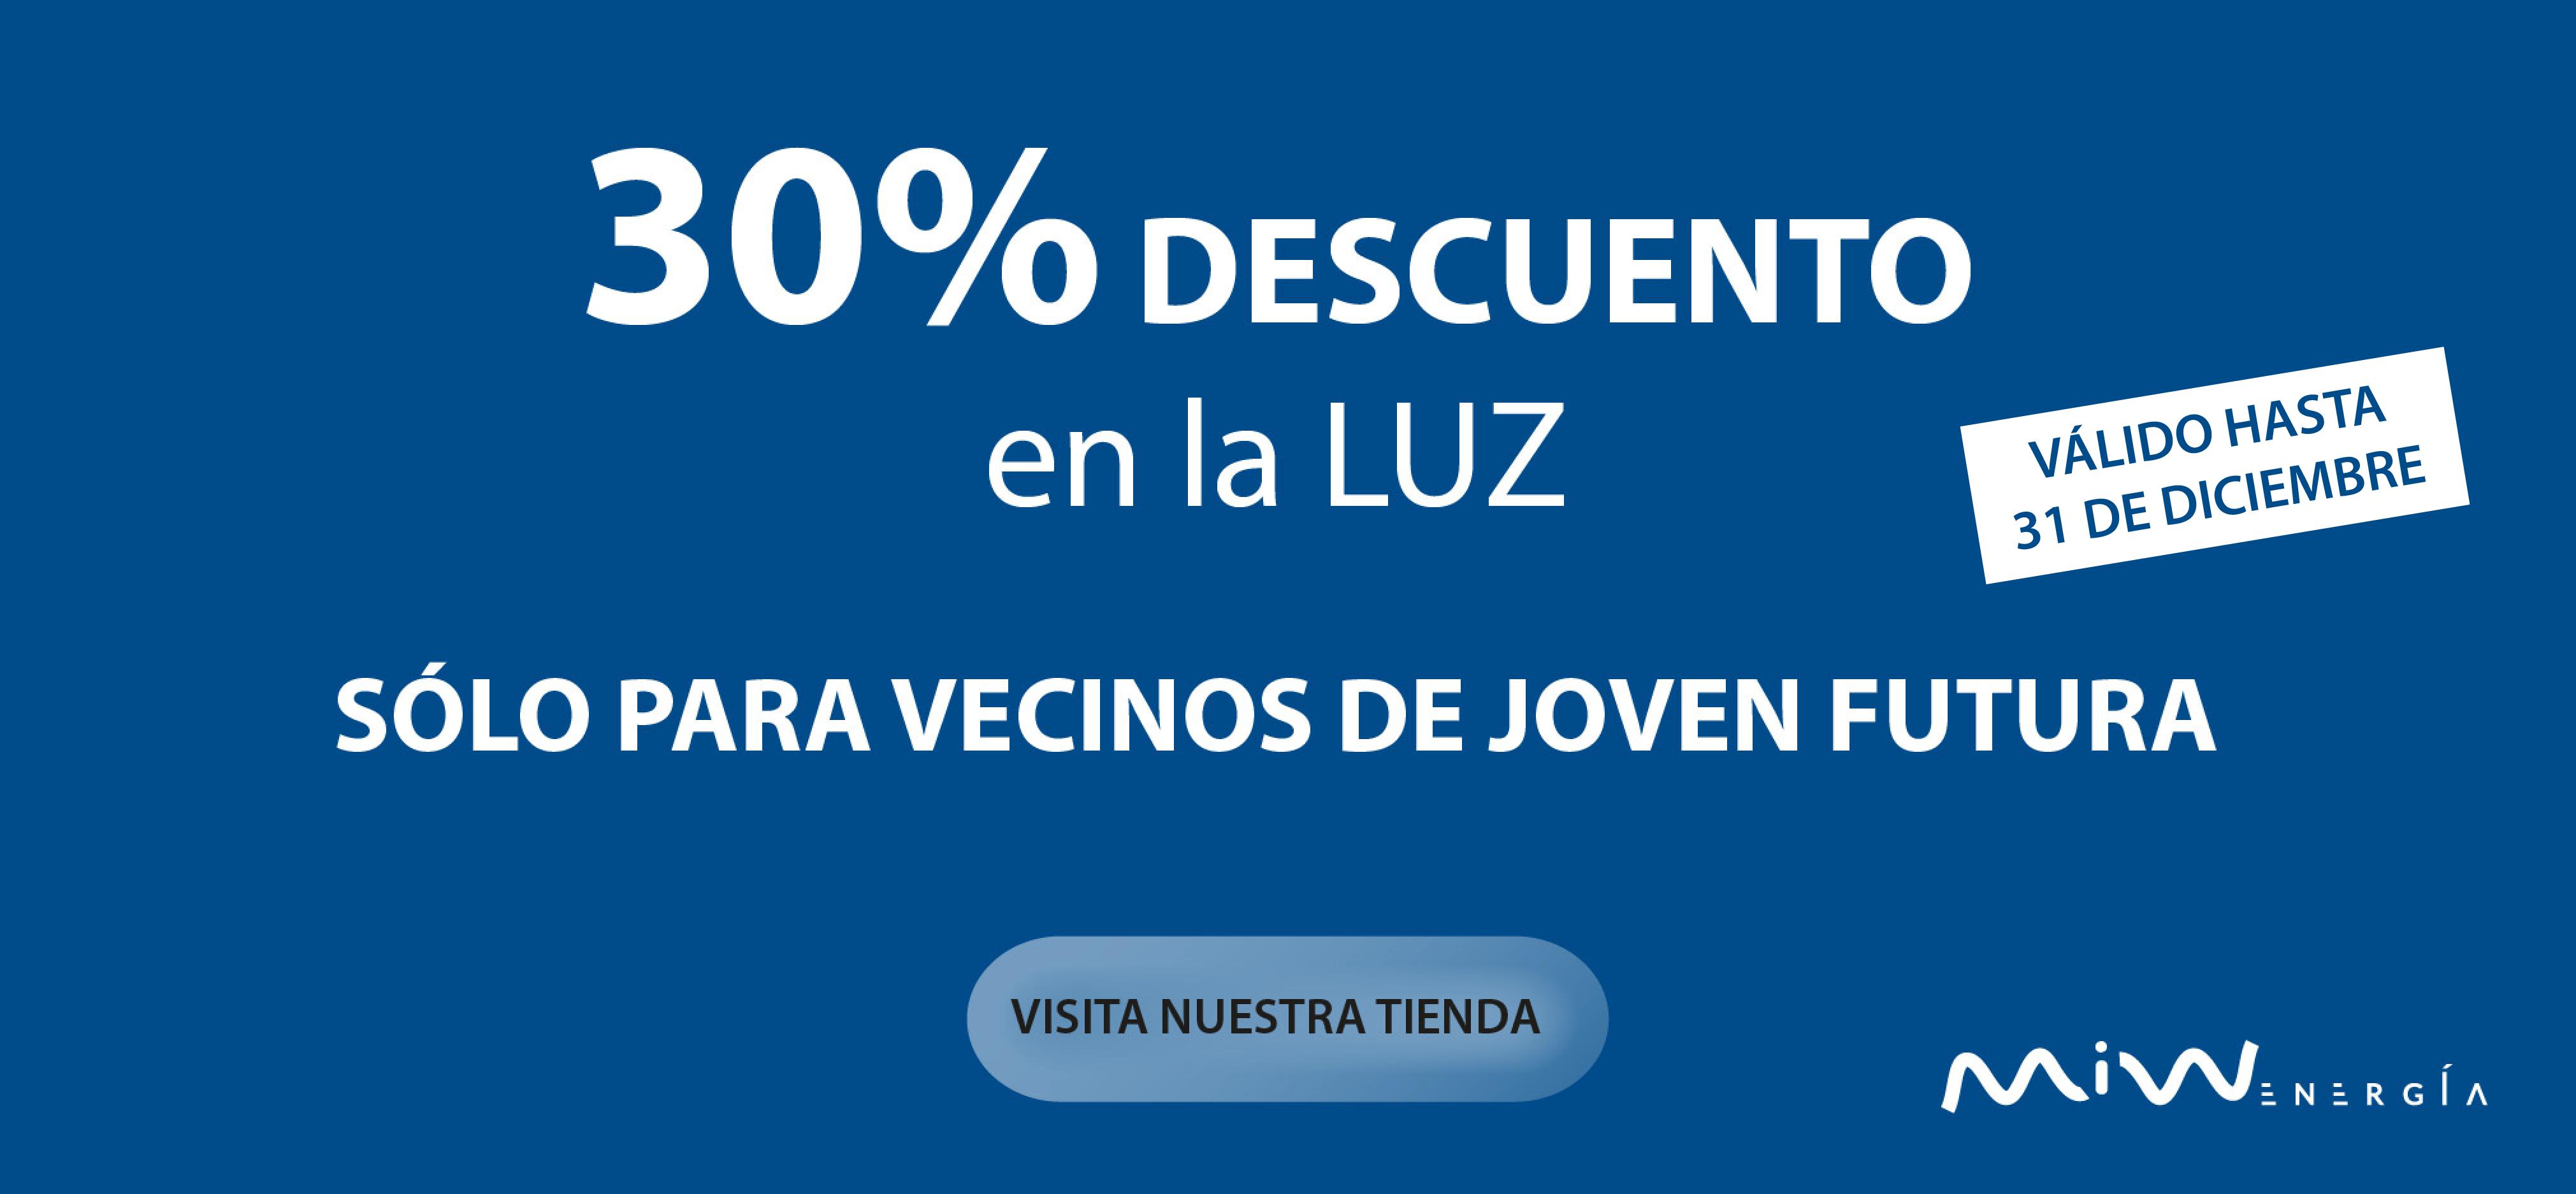 2018-12-18 Miwenergía - OFERTA-DICIEMBRE